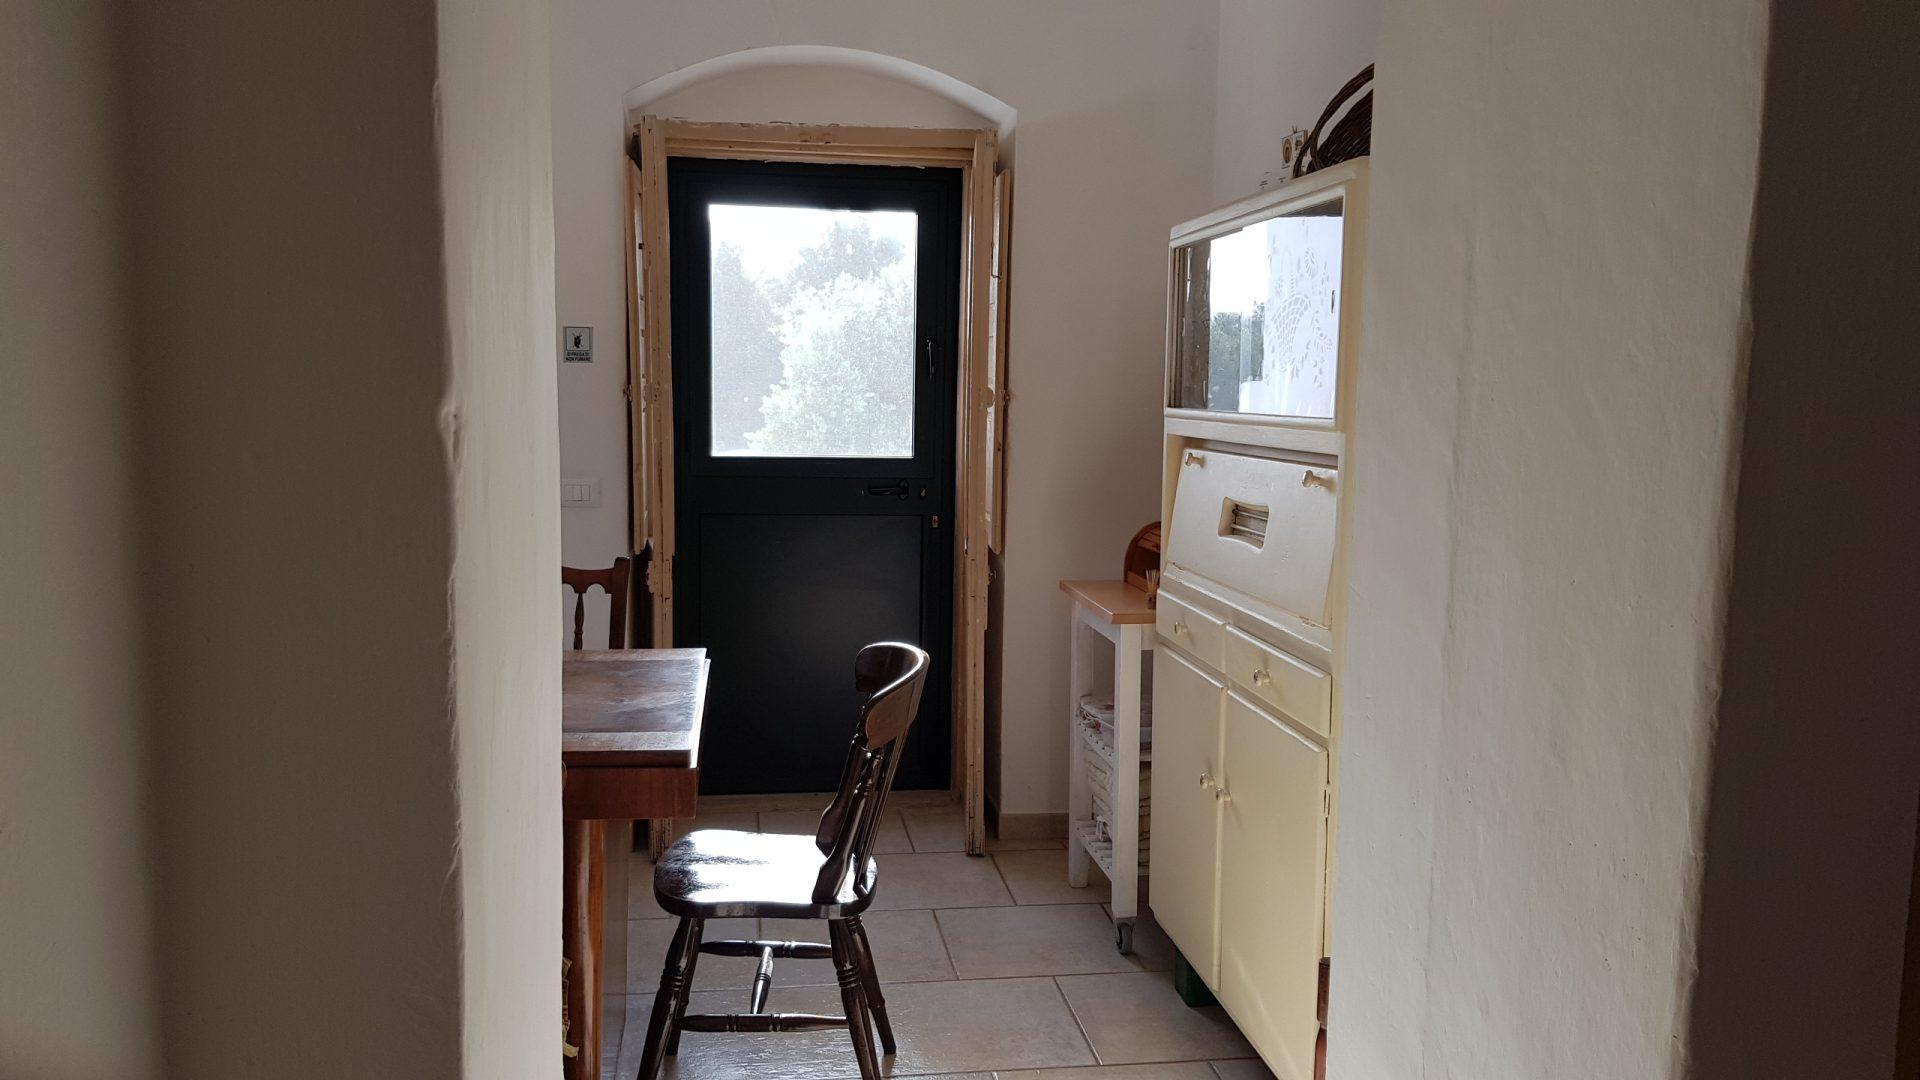 Access to the private terrace at Masseria Bellavista Ostuni Vacation holiday rental villa in Puglia with pool and seaview